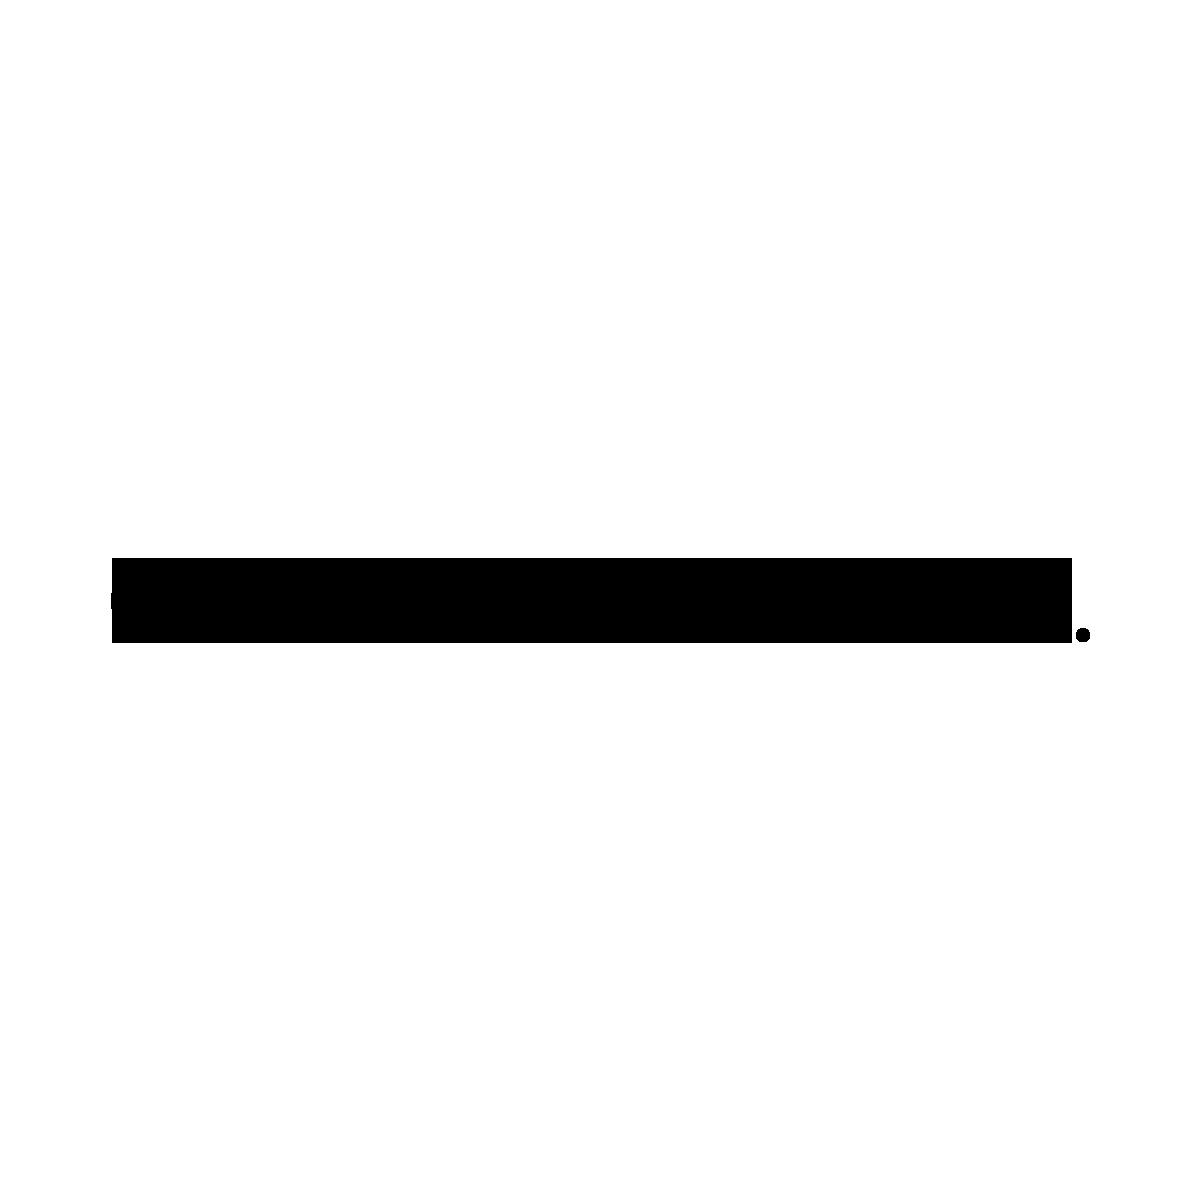 fred de la bretoniere loafer espadrille in geprint leer taupe 152010003 detail zool